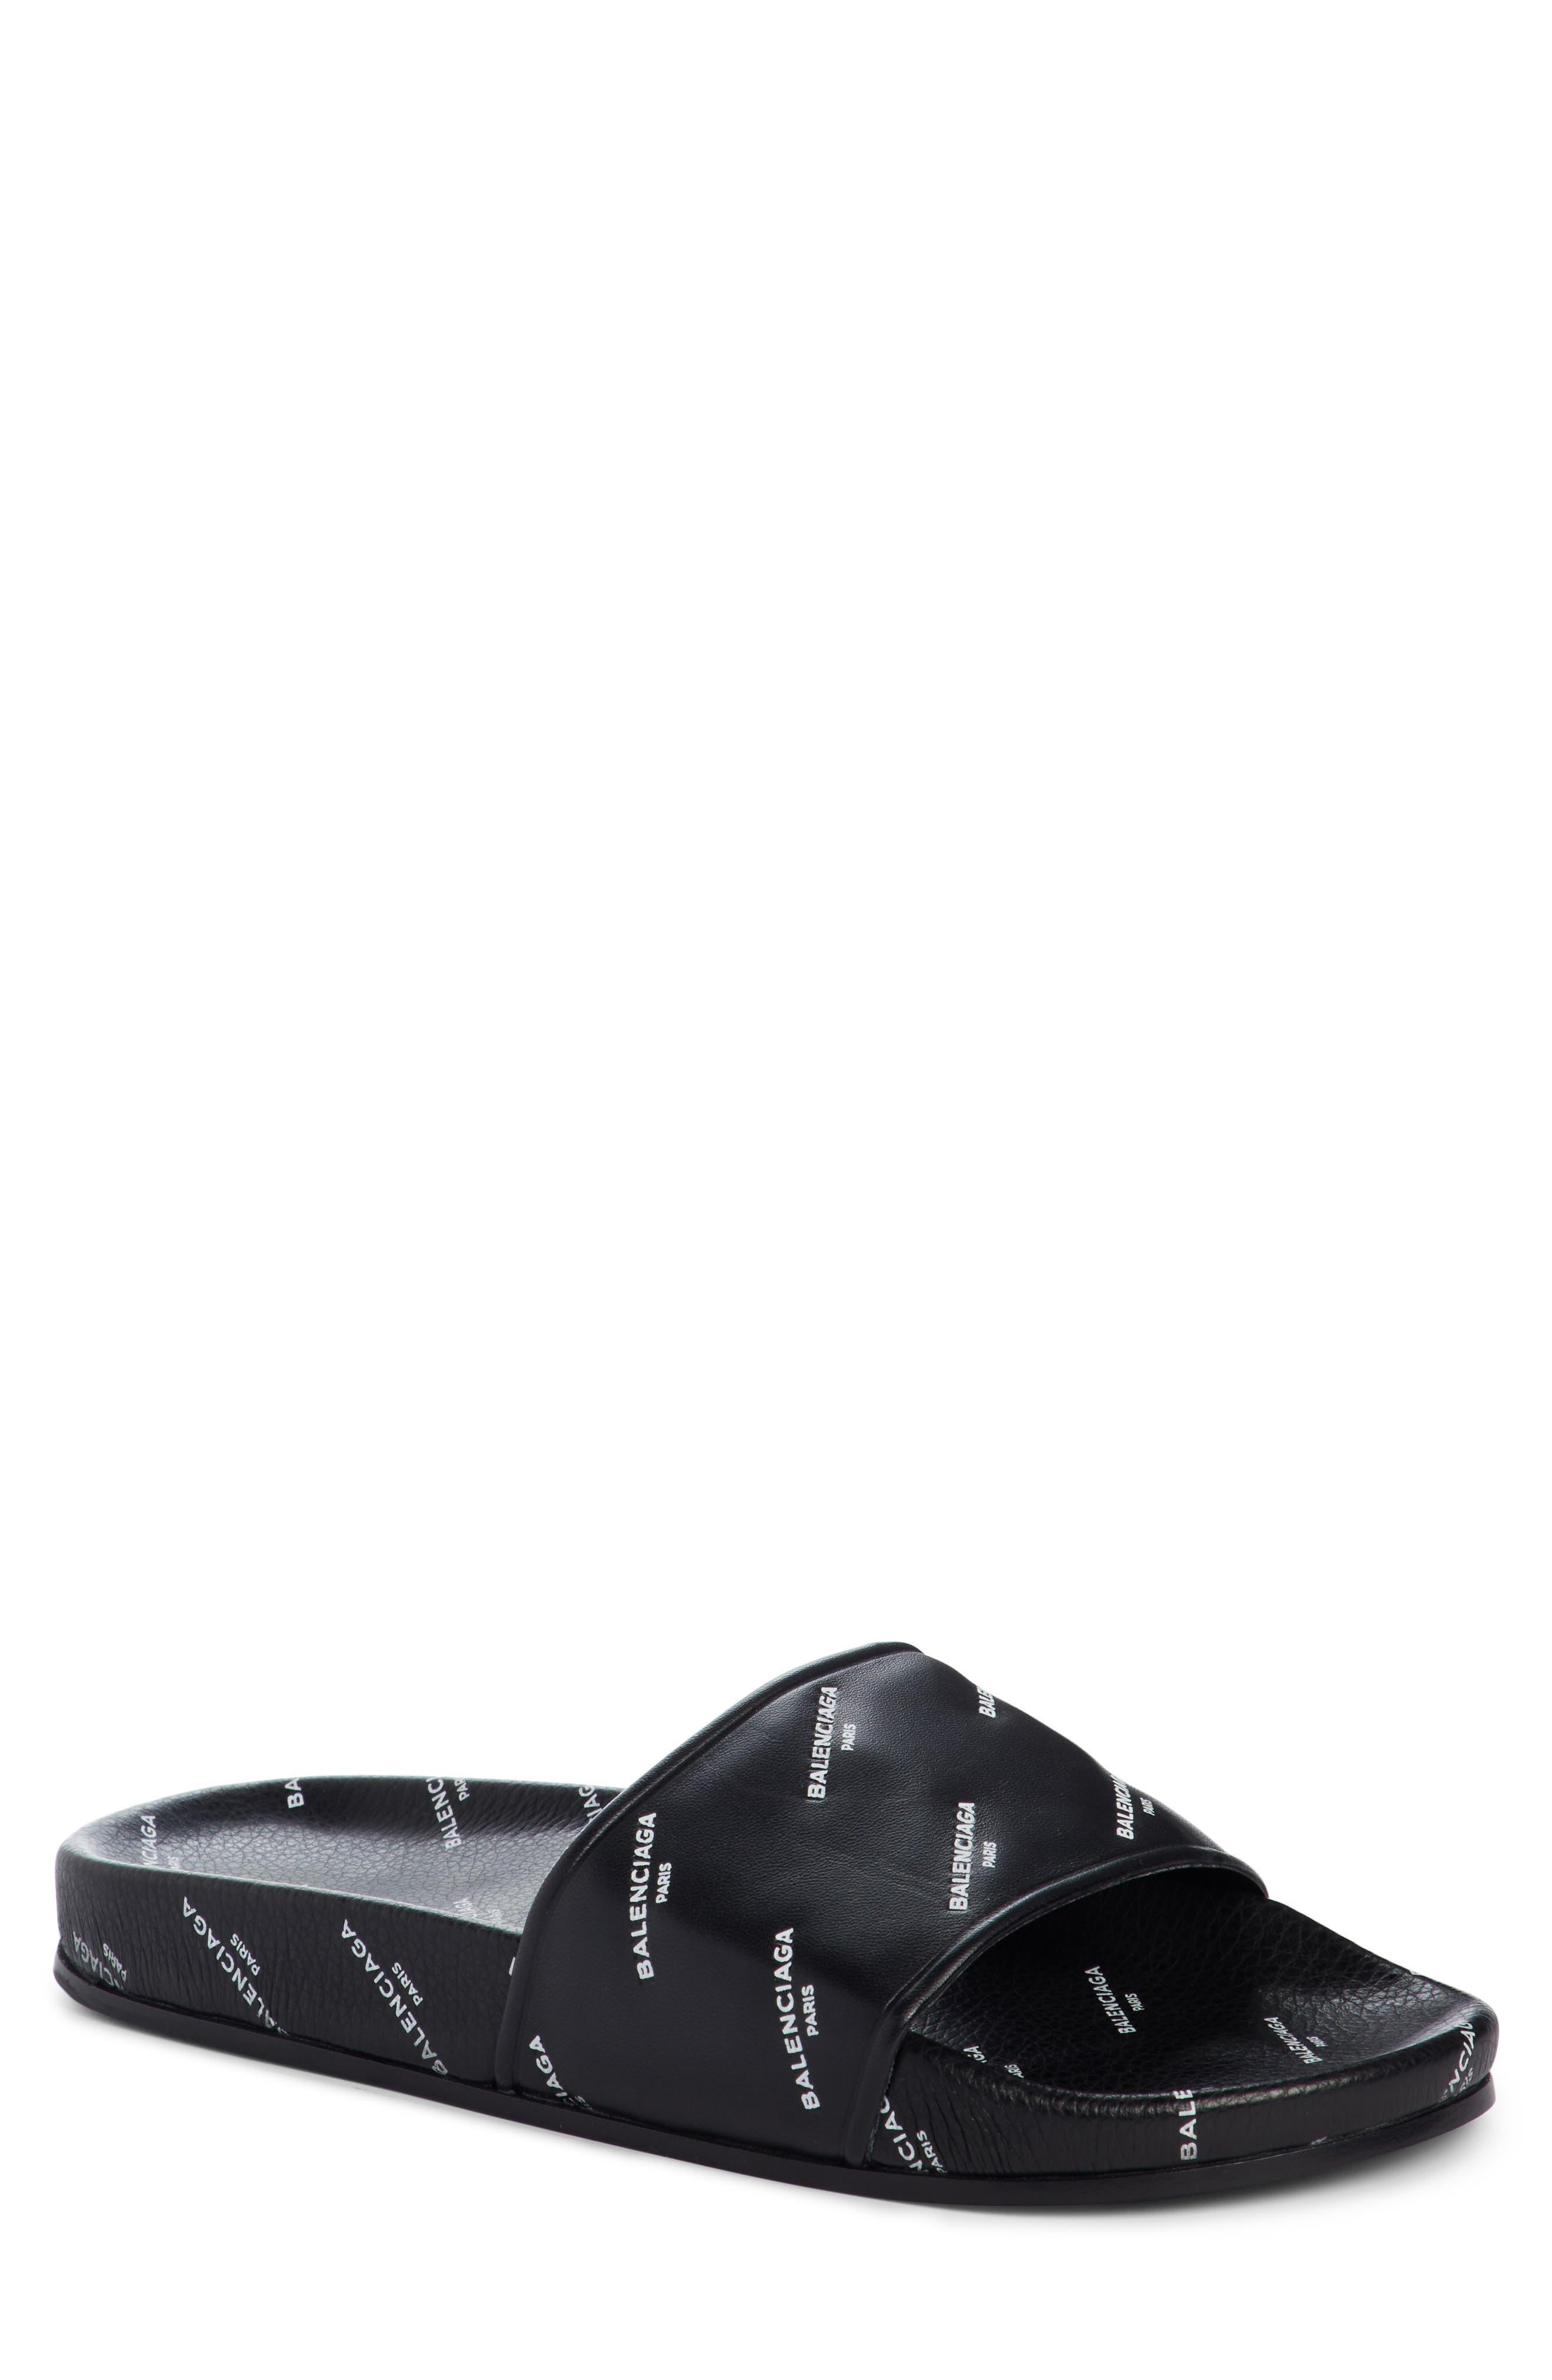 Main Image - Balenciaga Logo Print Slide Sandal (Women)